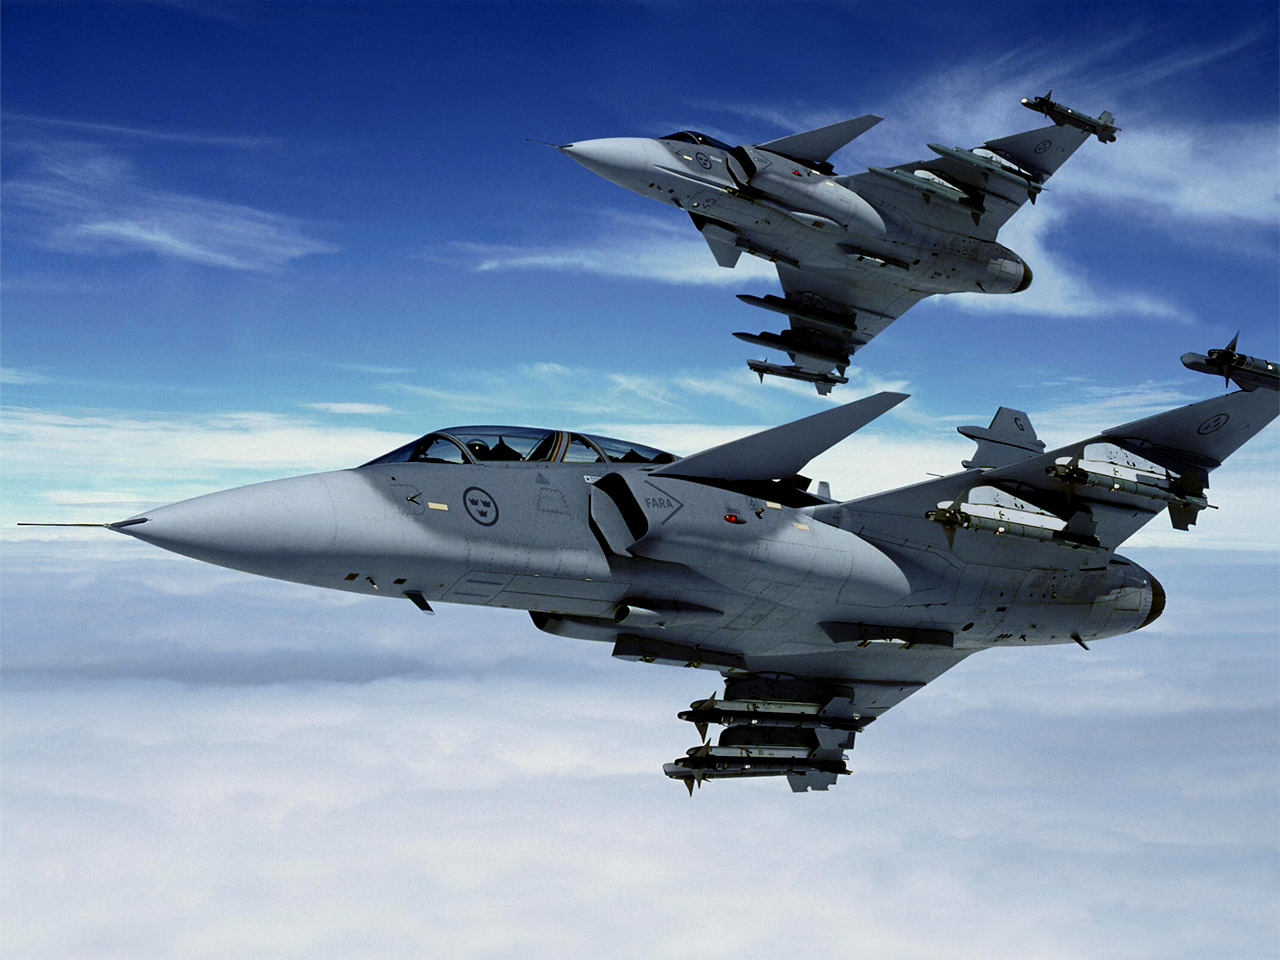 http://3.bp.blogspot.com/-Z3BQaqtvCoo/UAcYp6rPMuI/AAAAAAAAAC4/aRUhMejtSu4/s1600/Airplanes-Wallpaper+(10).jpg